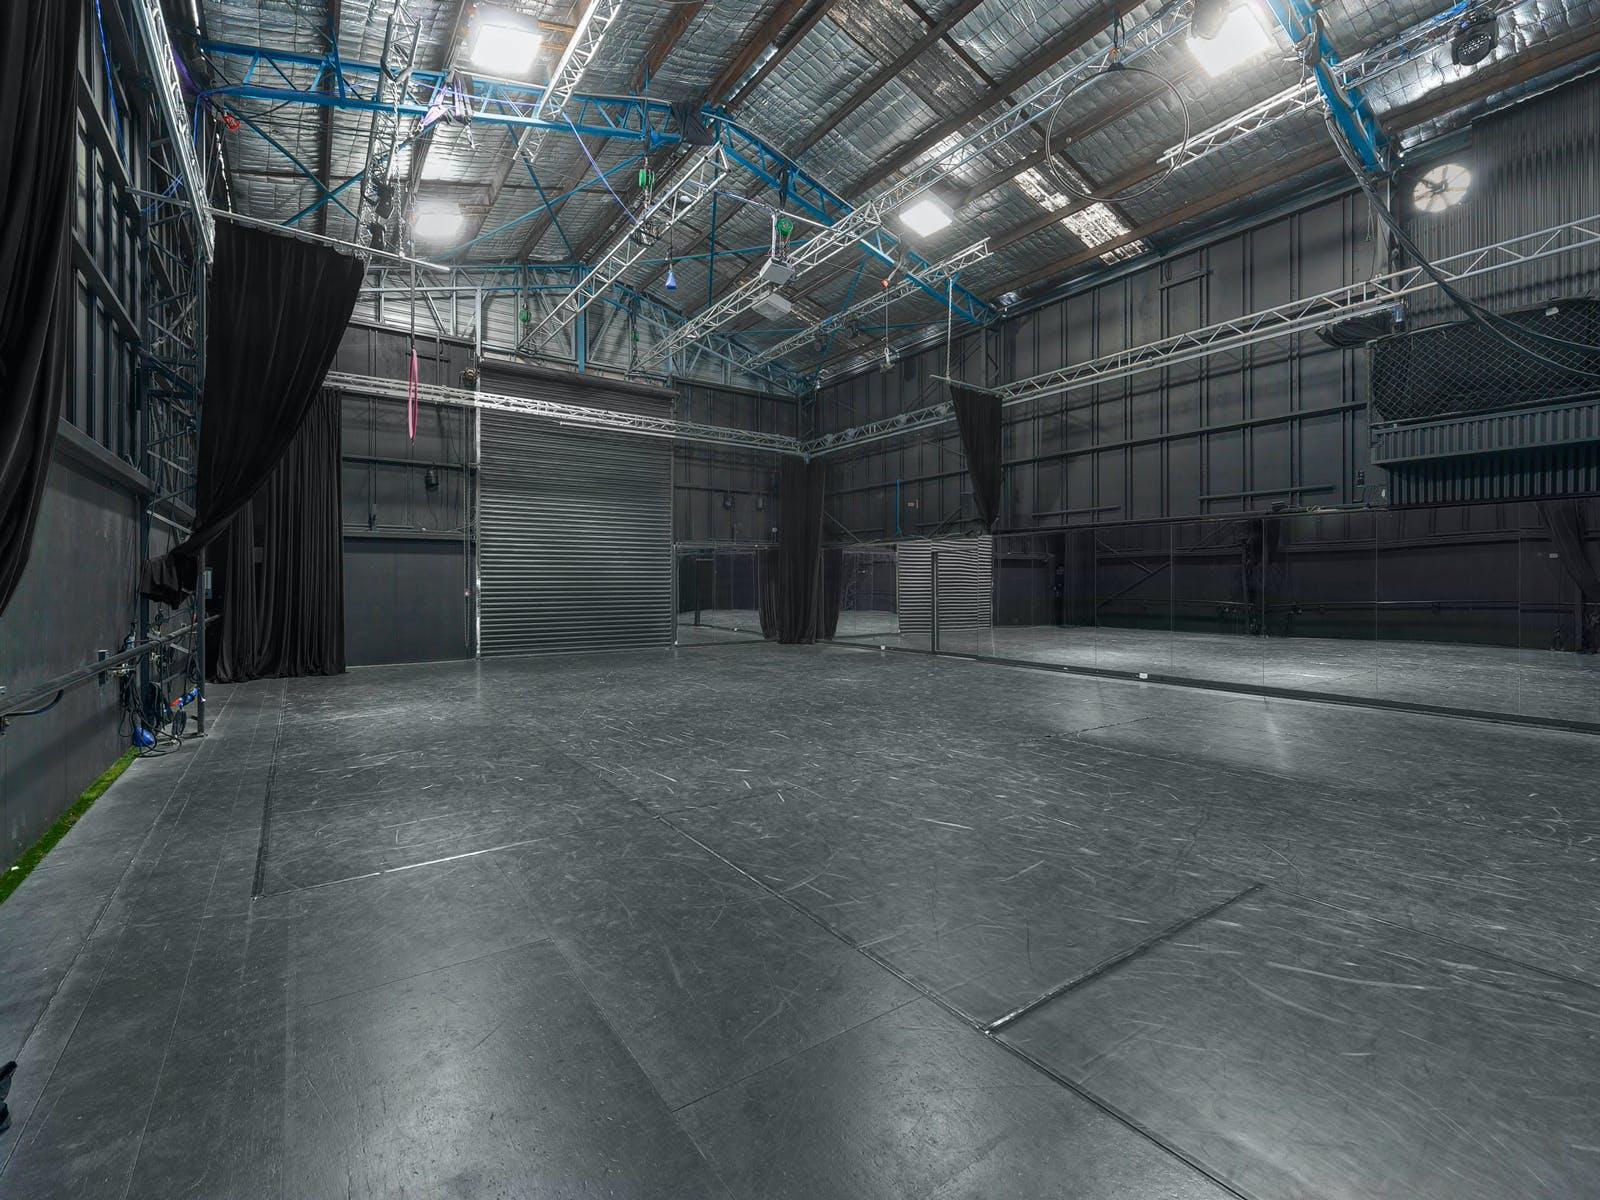 Studio 1, multi-use area at Raw Studios, image 1